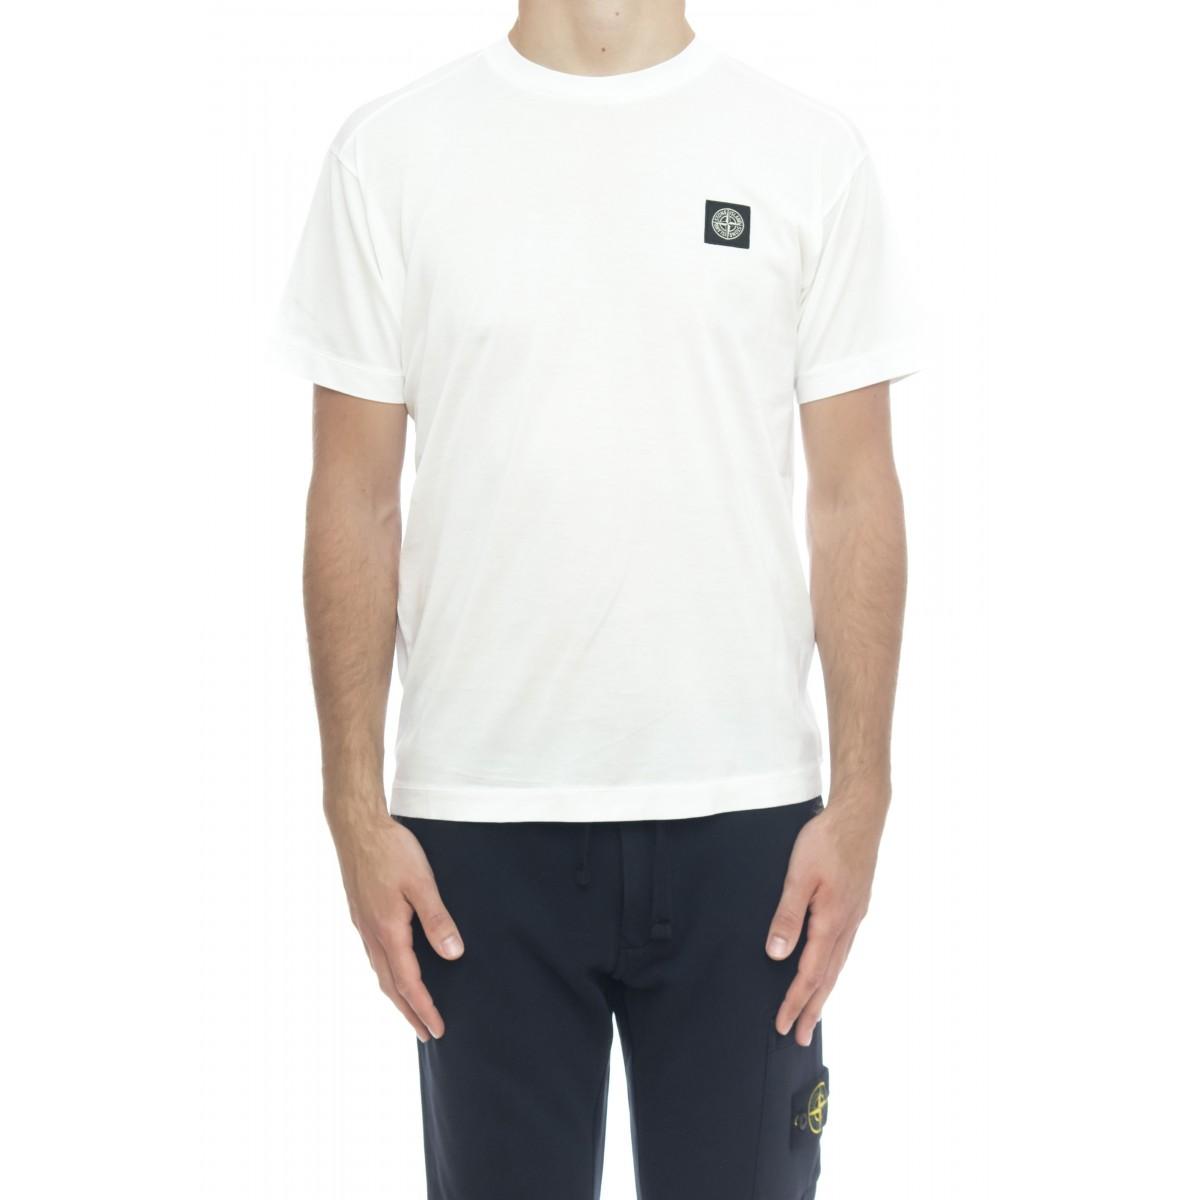 T-shirt - 24113 t-shirt basica logo